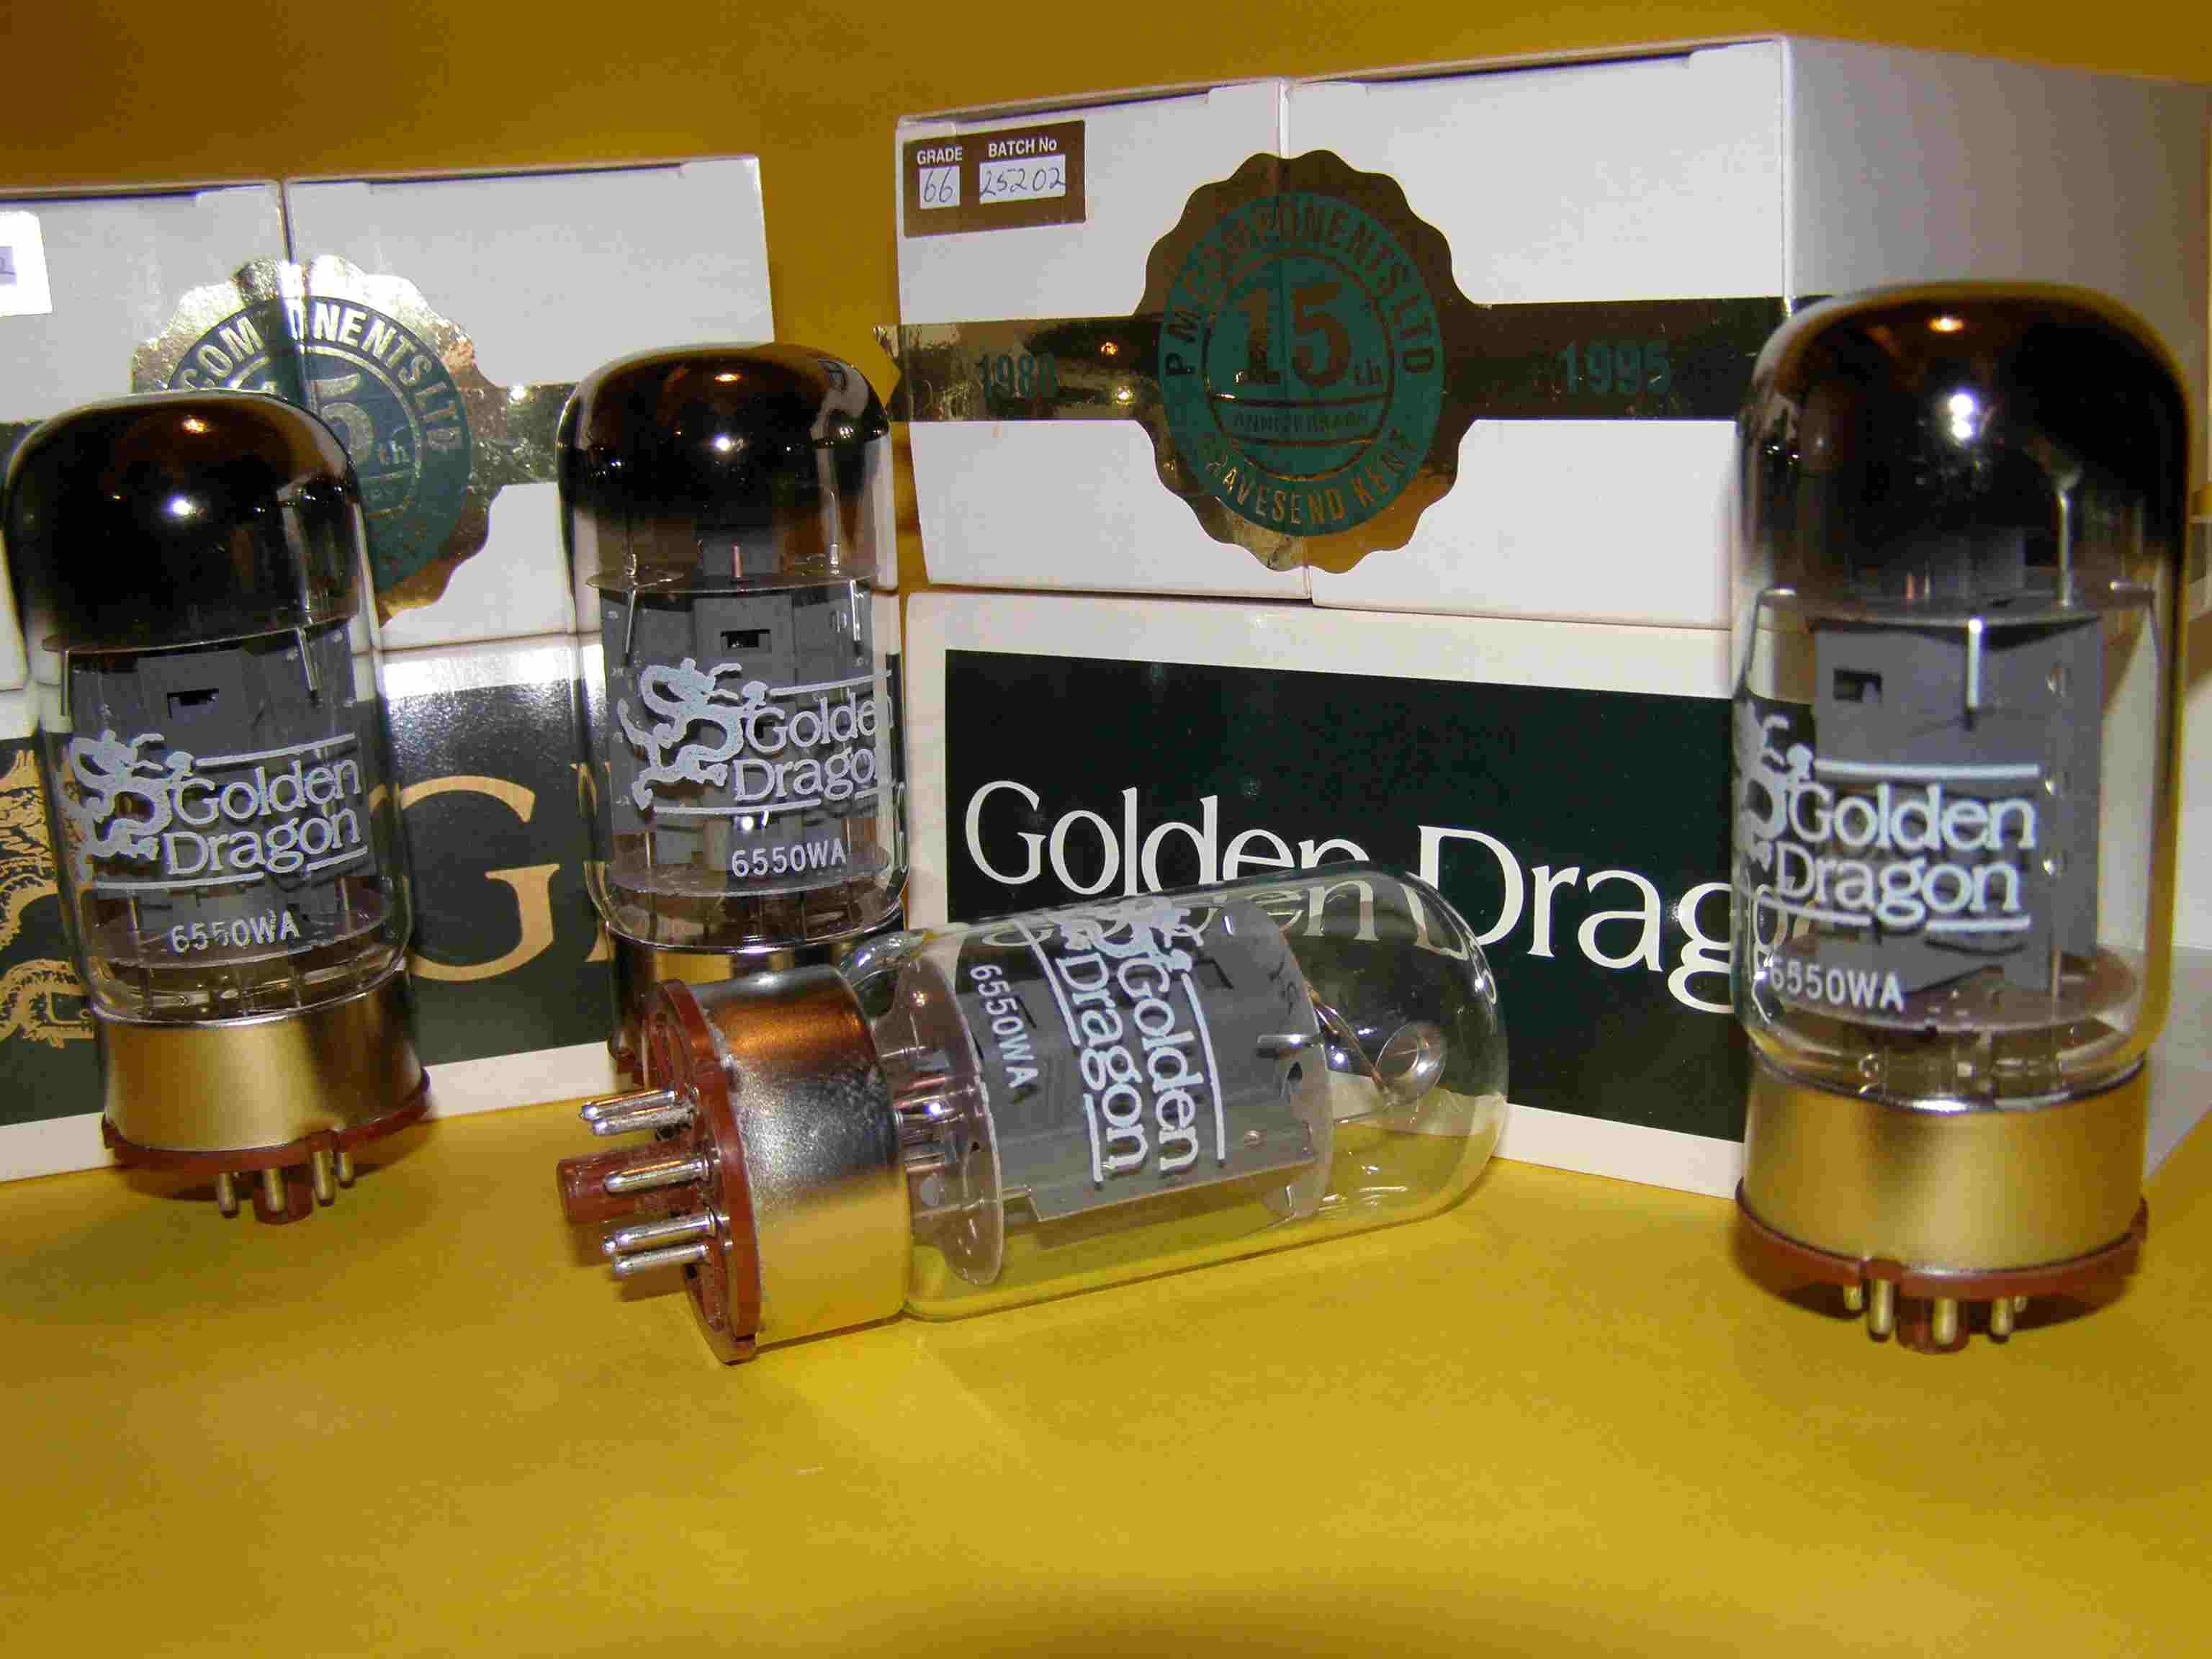 golden dragon 6l6wgb tubes